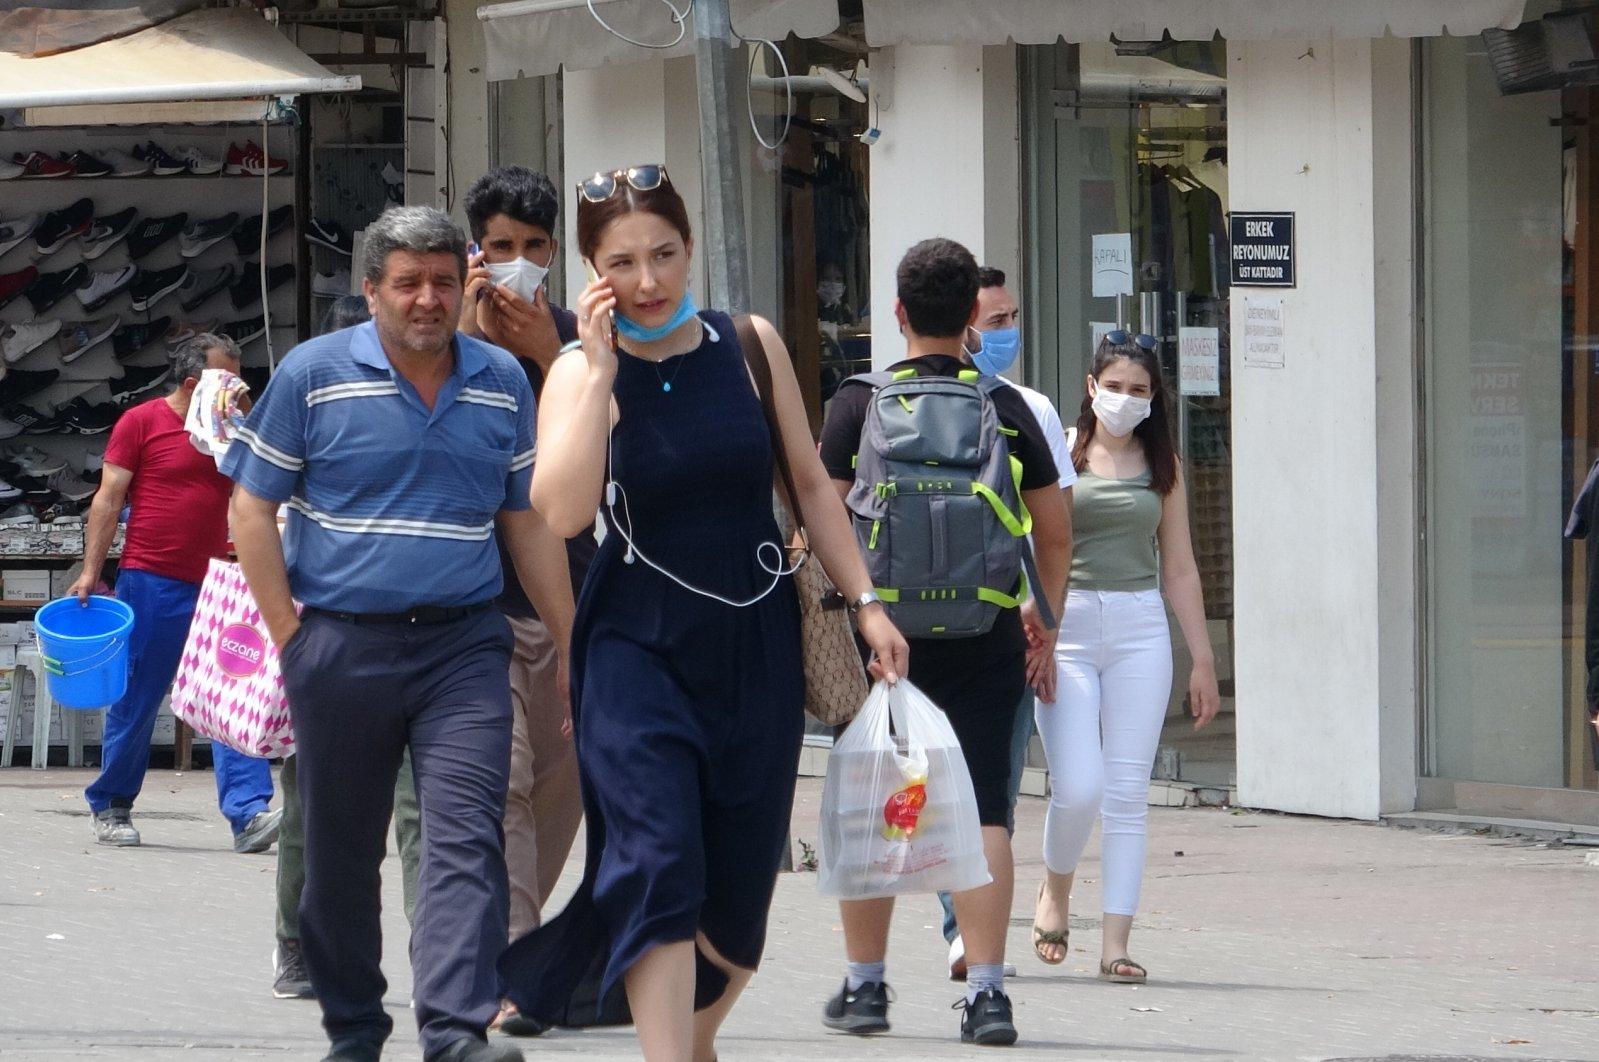 People wearing masks and those not wearing masks walking on a street in Bursa, Turkey, July 6, 2020. (DHA Photo)